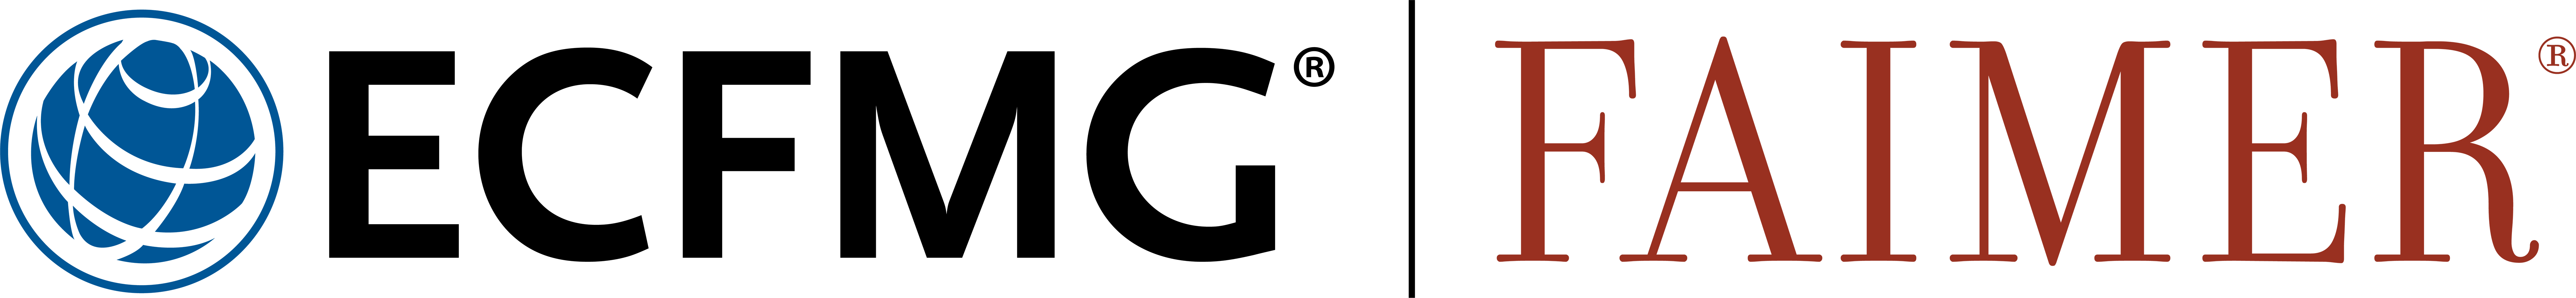 Educational Commission  for Foreign Medical Graduates / FAIMER logo